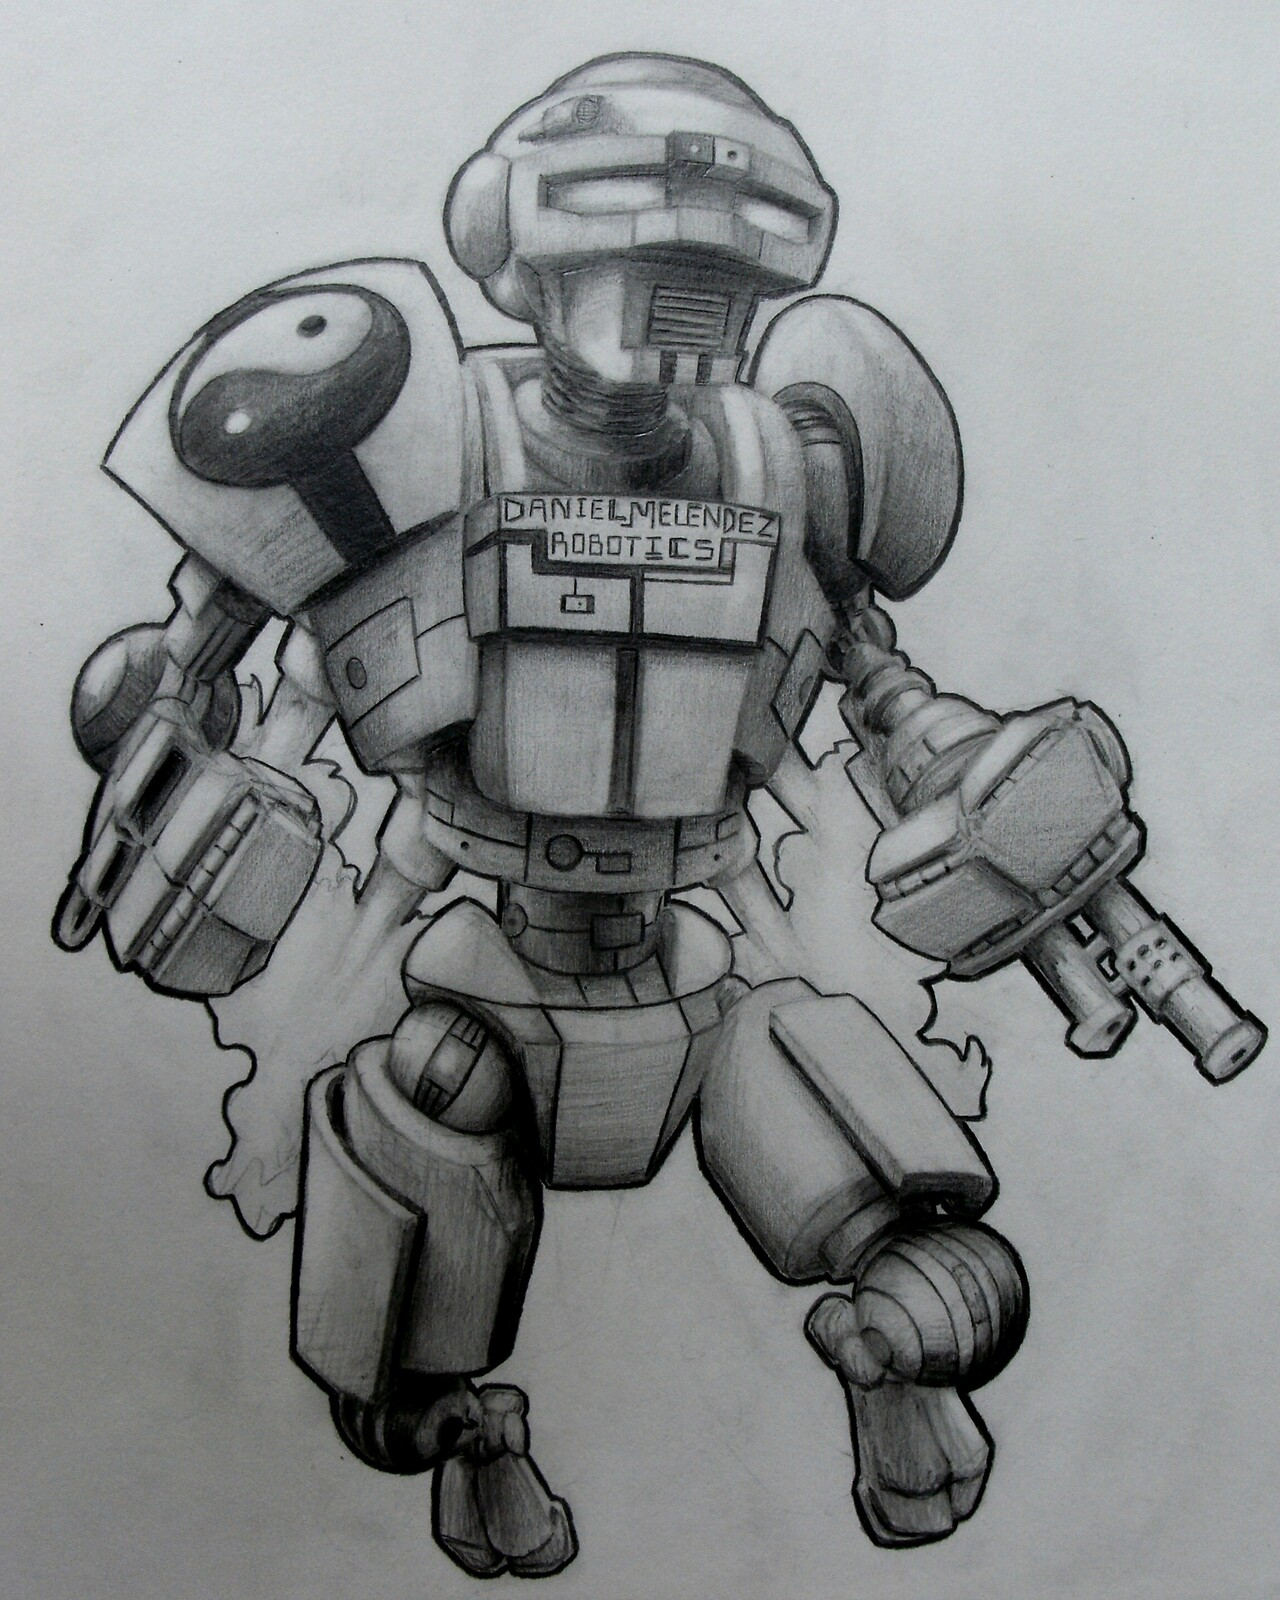 Robot I drew in 2011